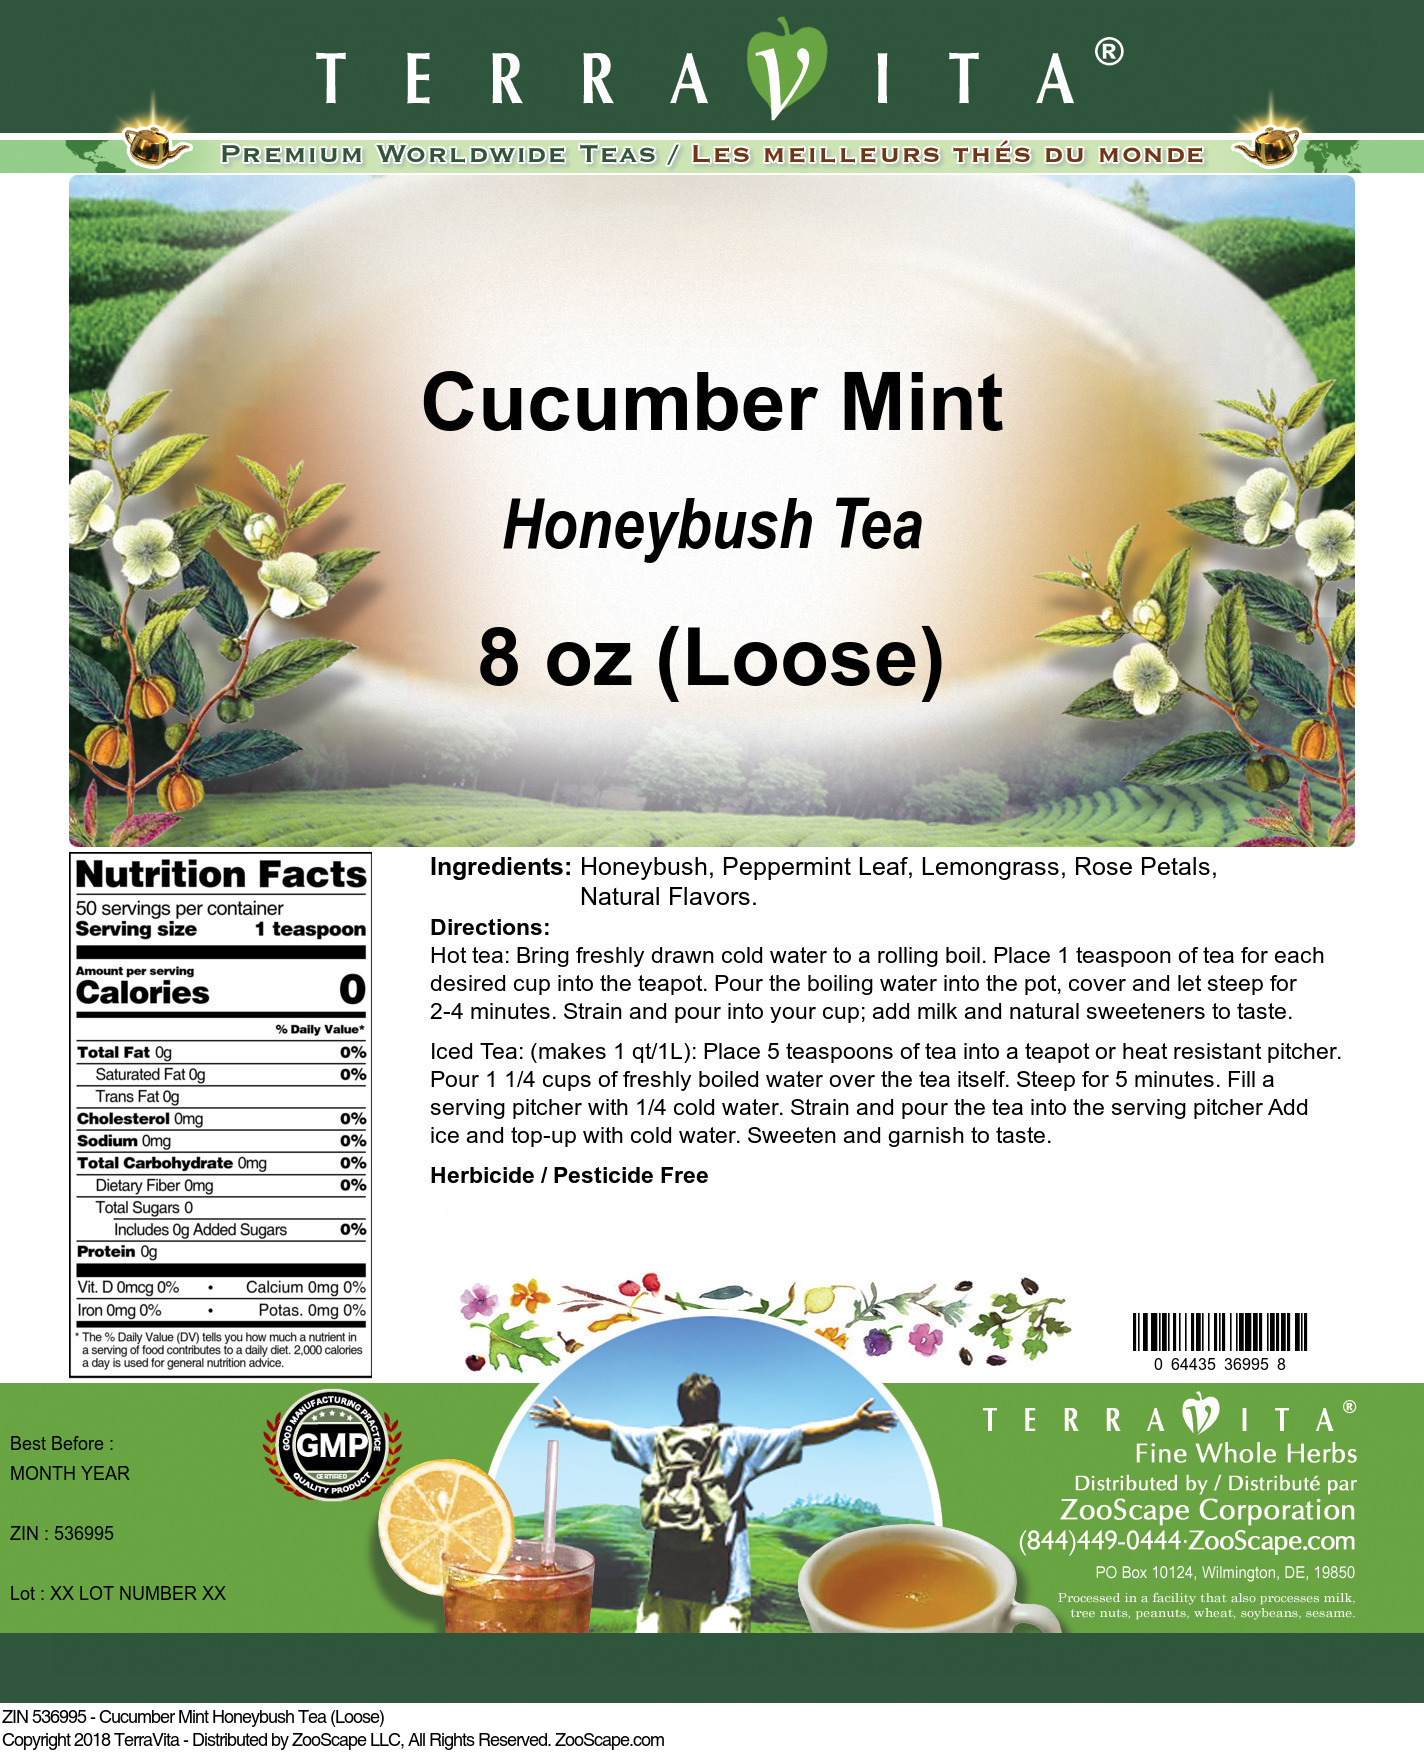 Cucumber Mint Honeybush Tea (Loose)